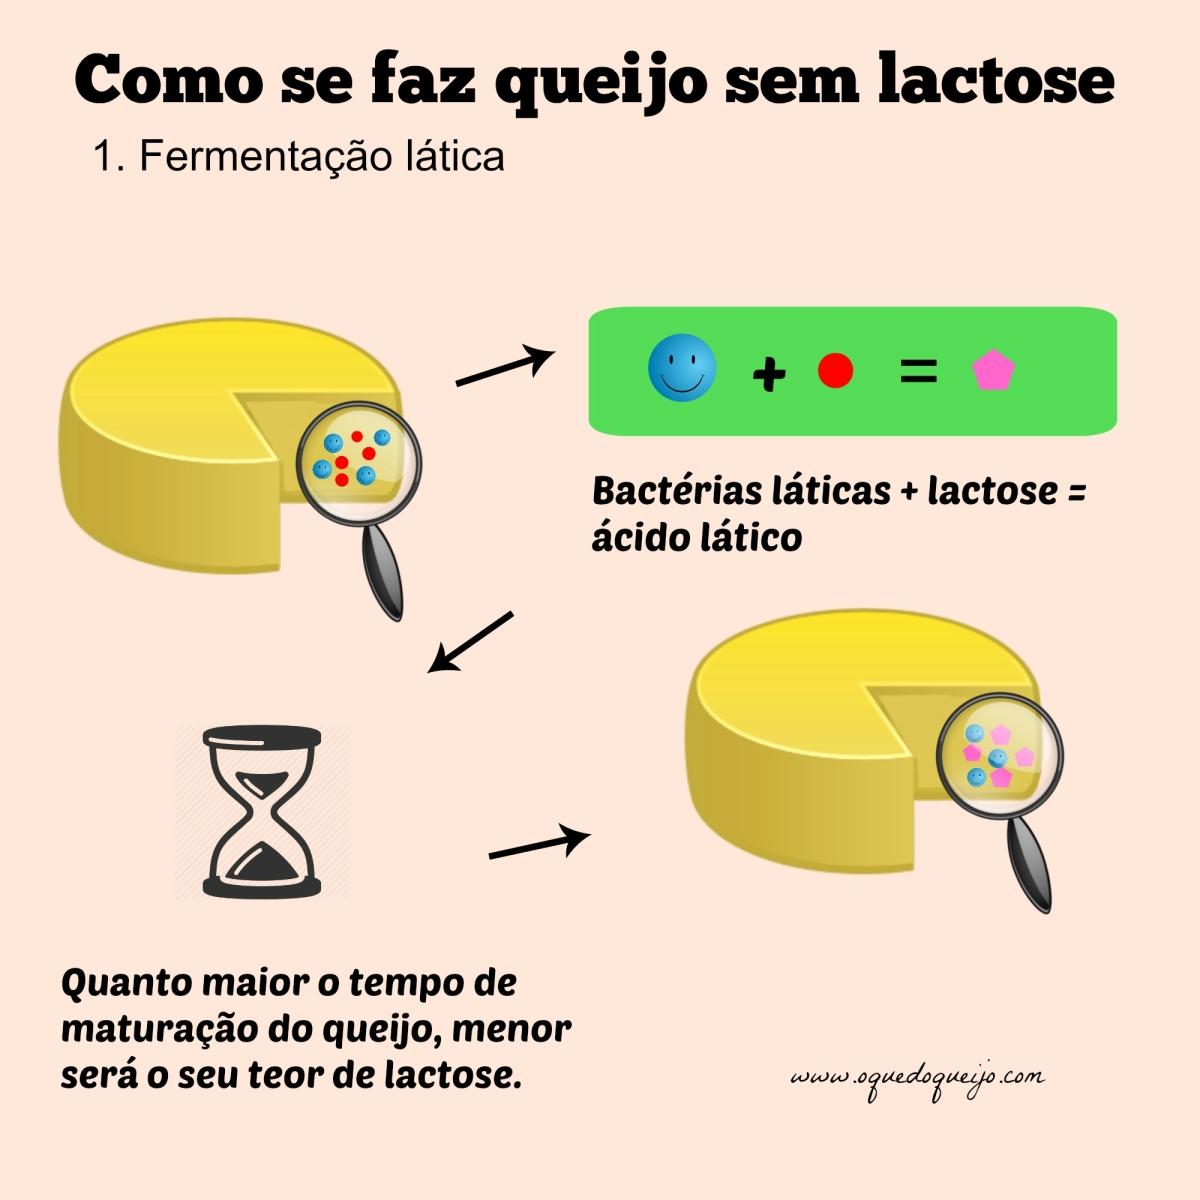 Como se faz queijo sem lactose